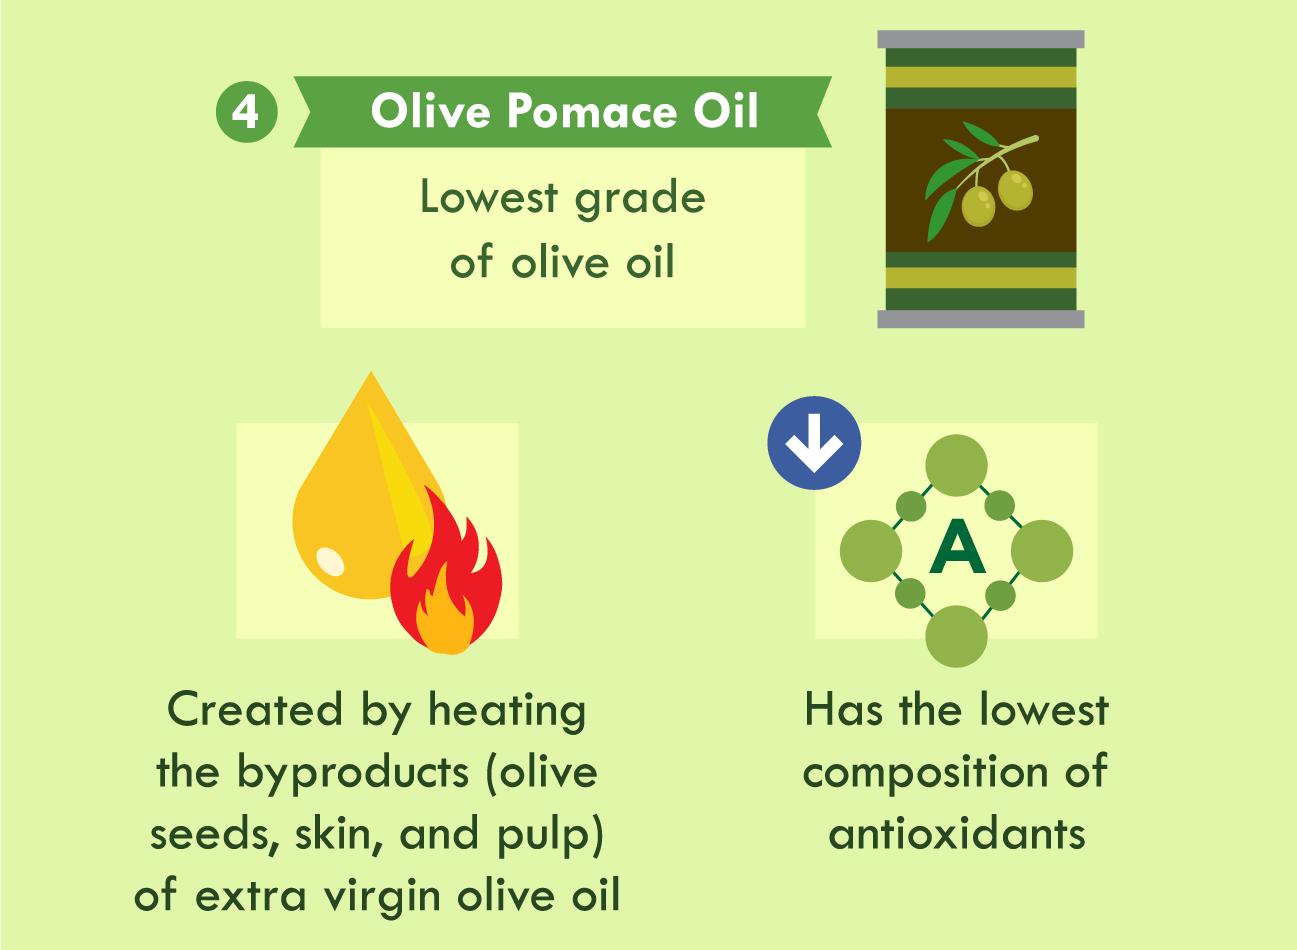 illustration of olive pomace oil